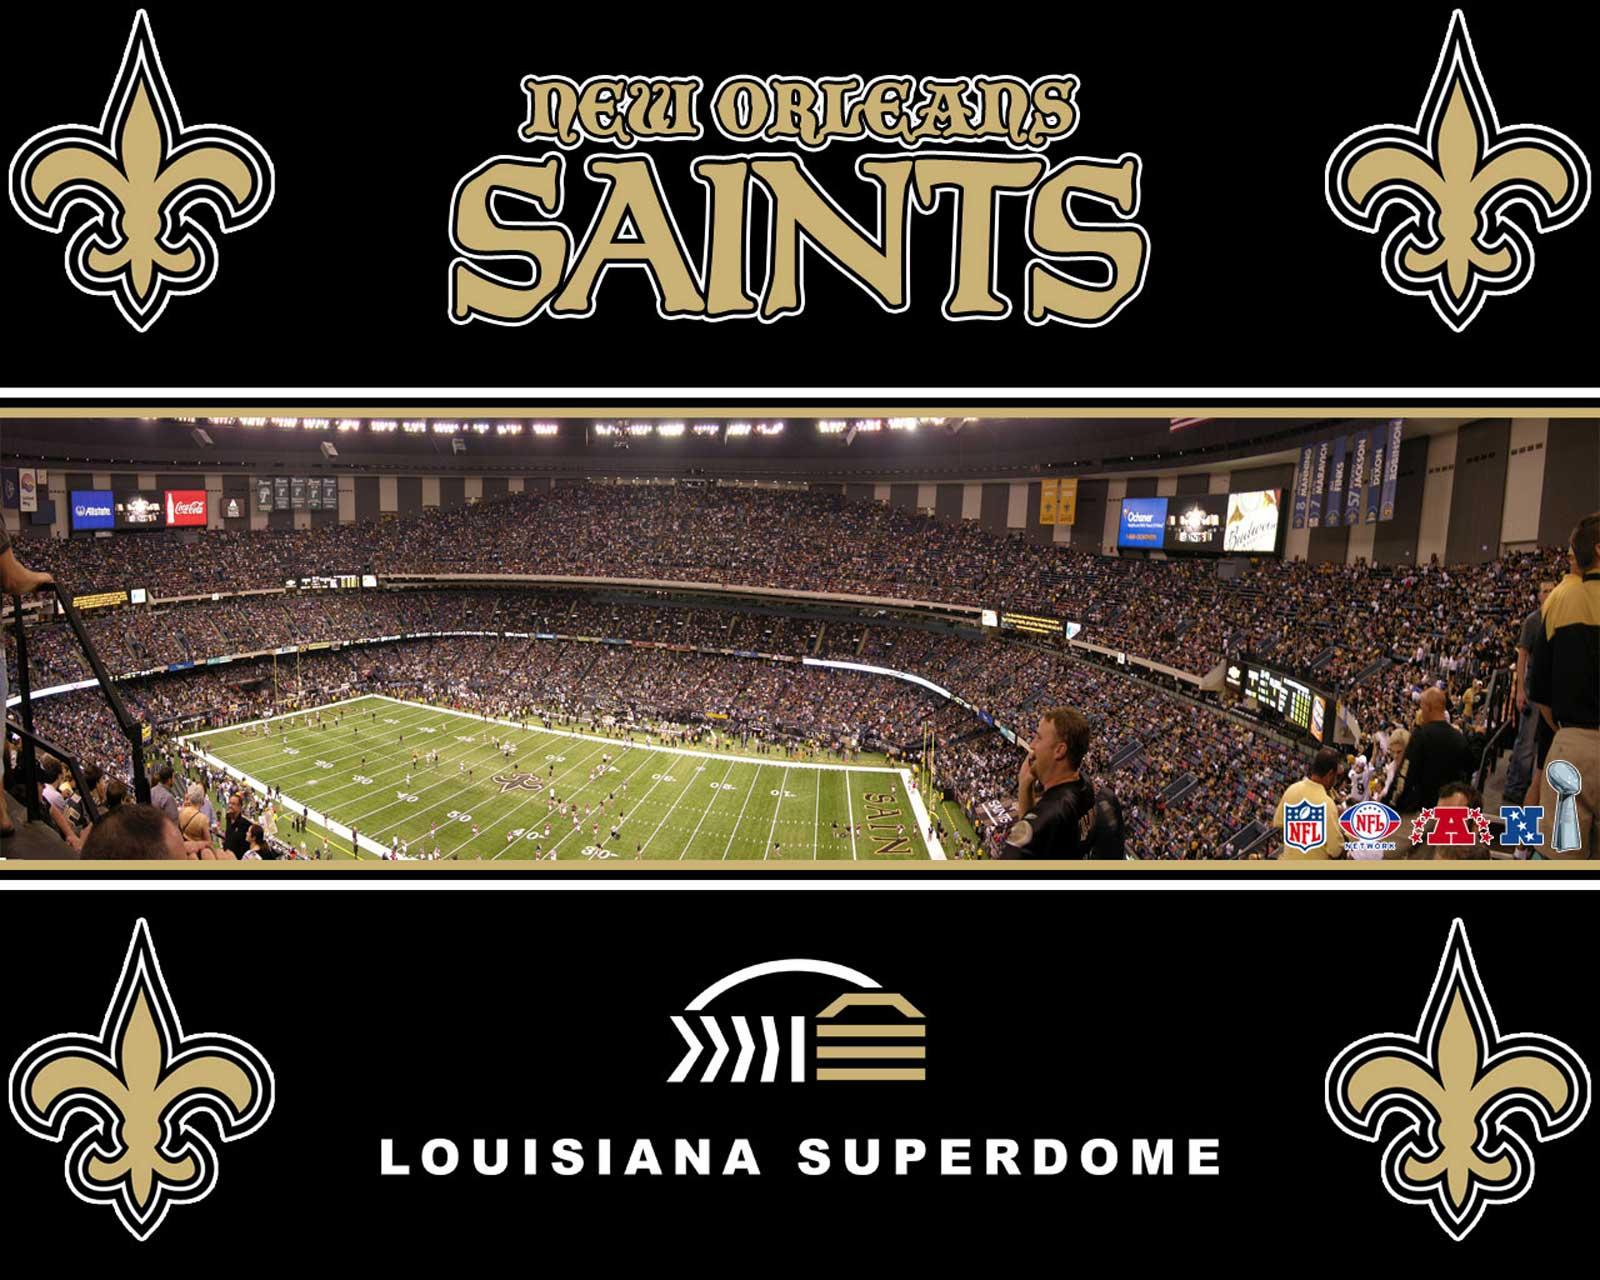 New Orleans Saints wallpaper HD images New Orleans Saints wallpapers 1600x1280